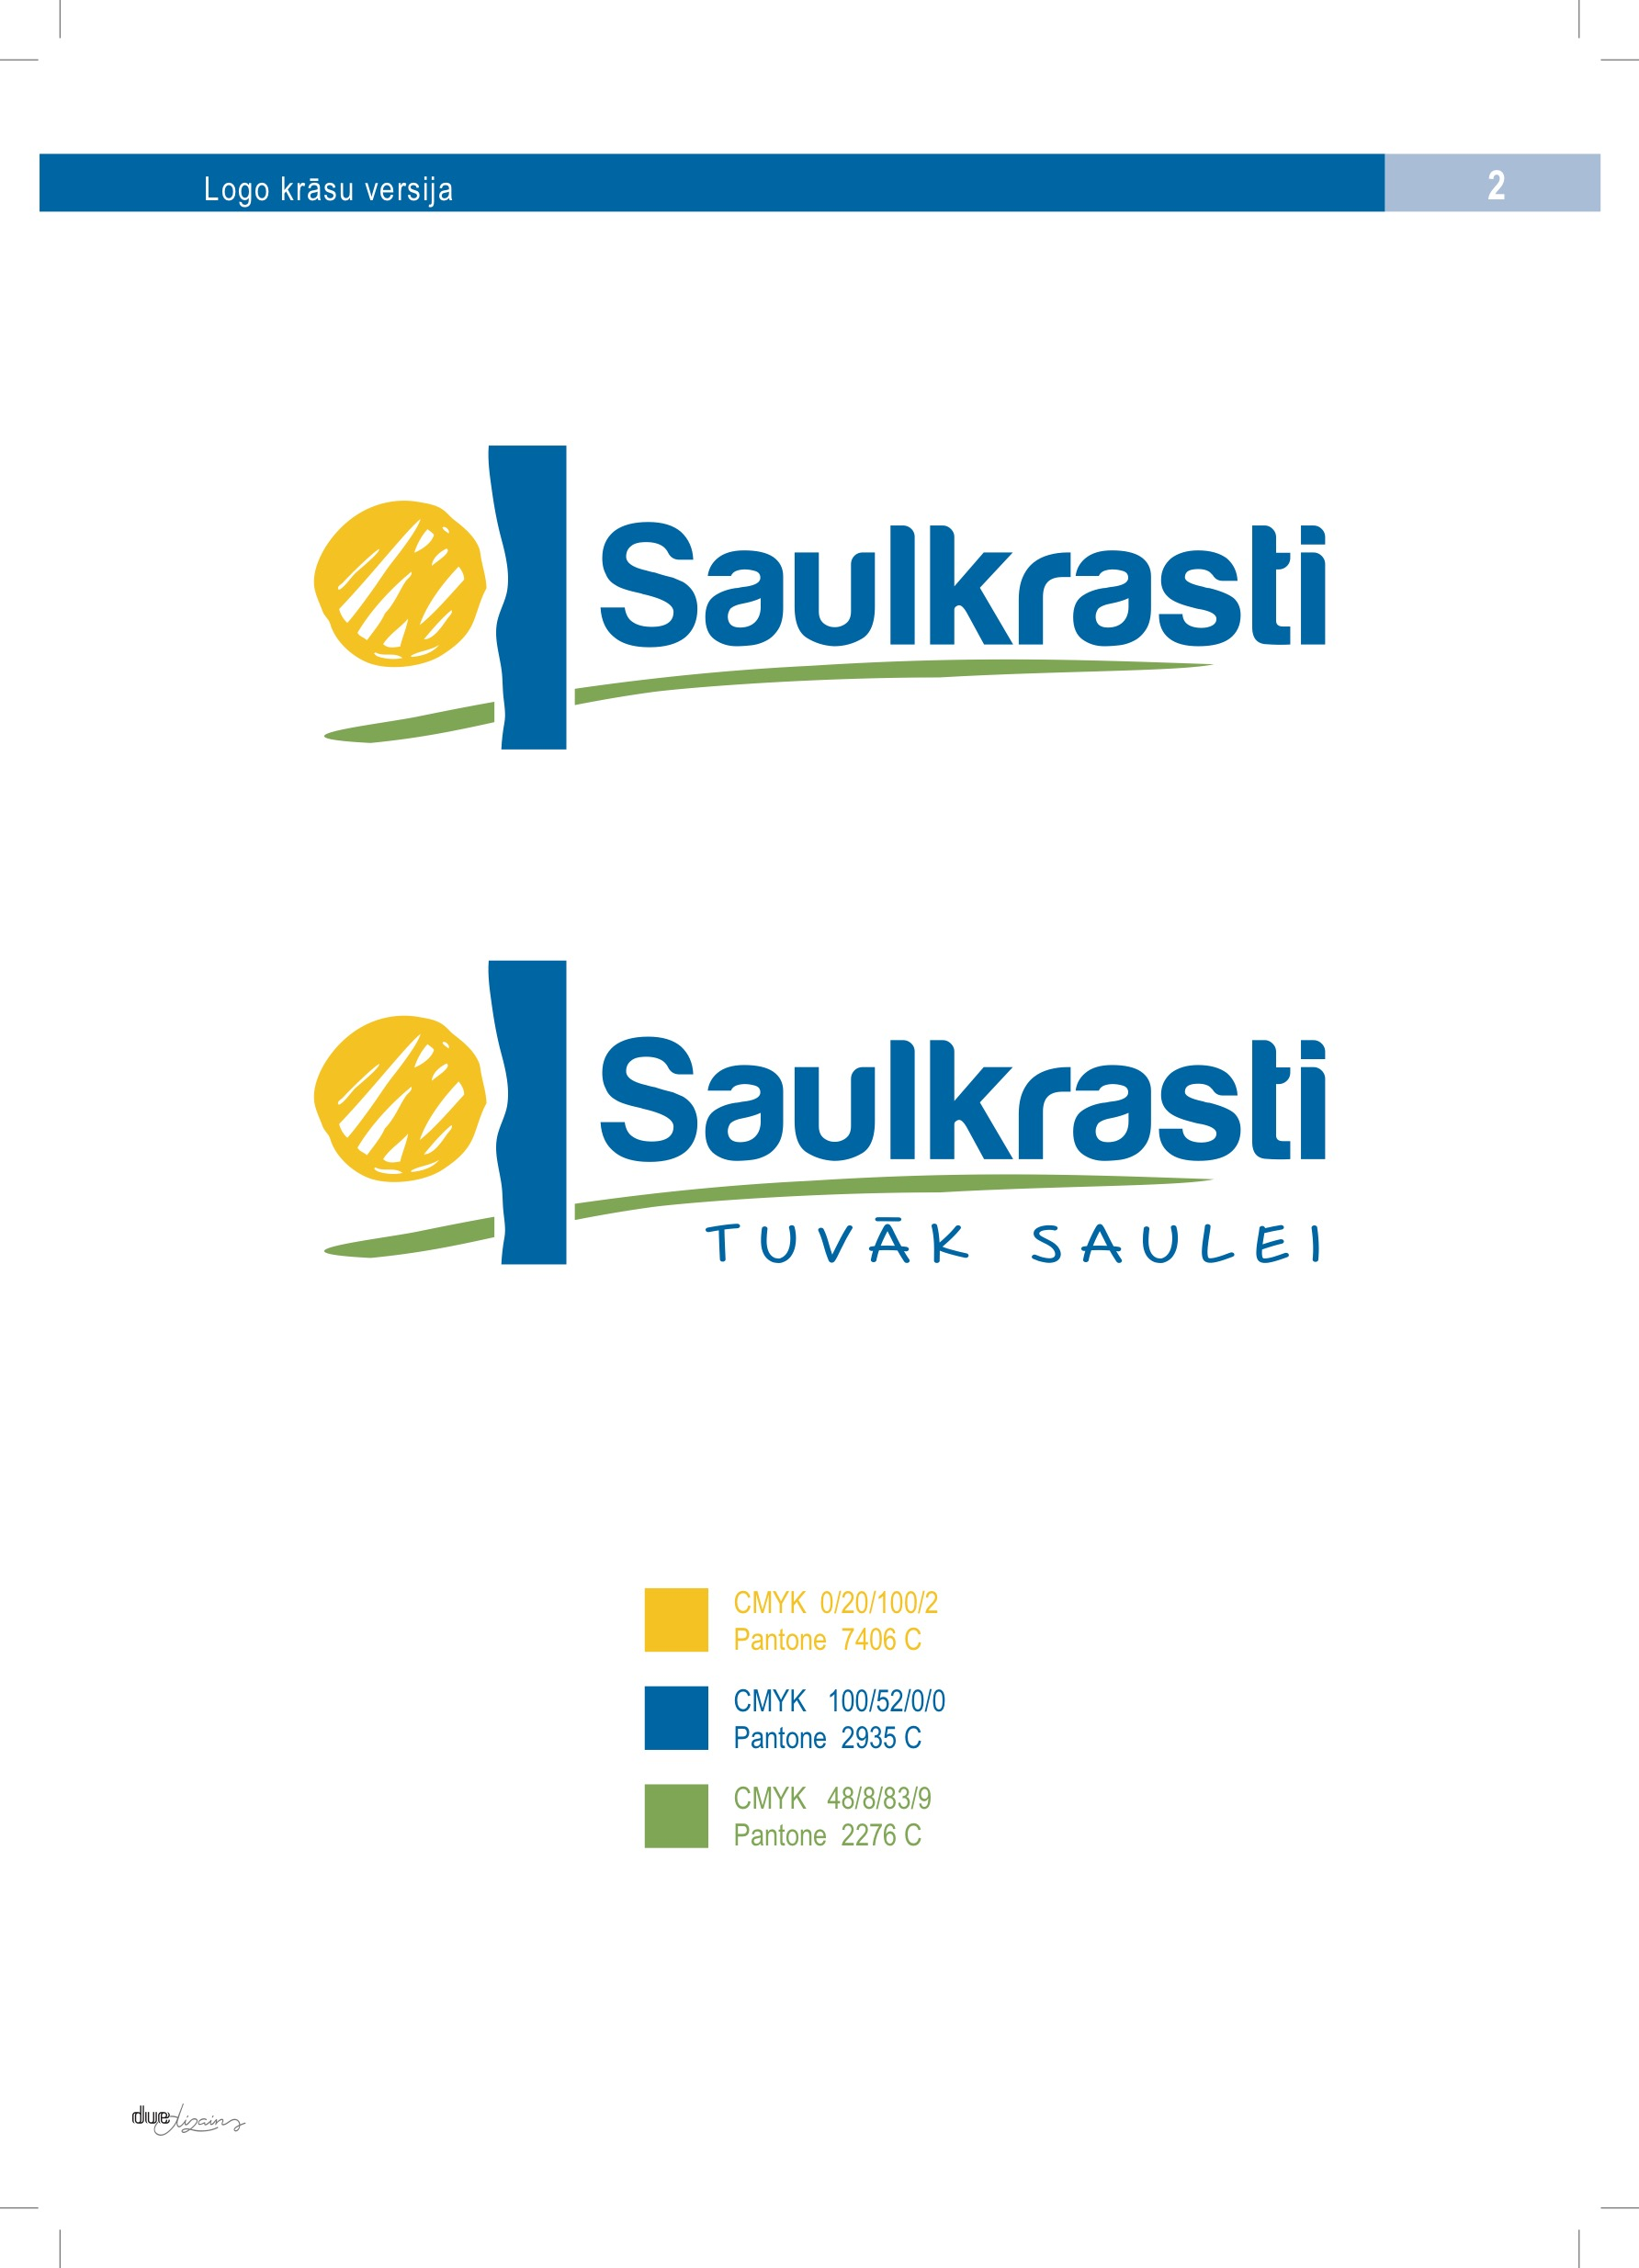 saulkrasti-print 4